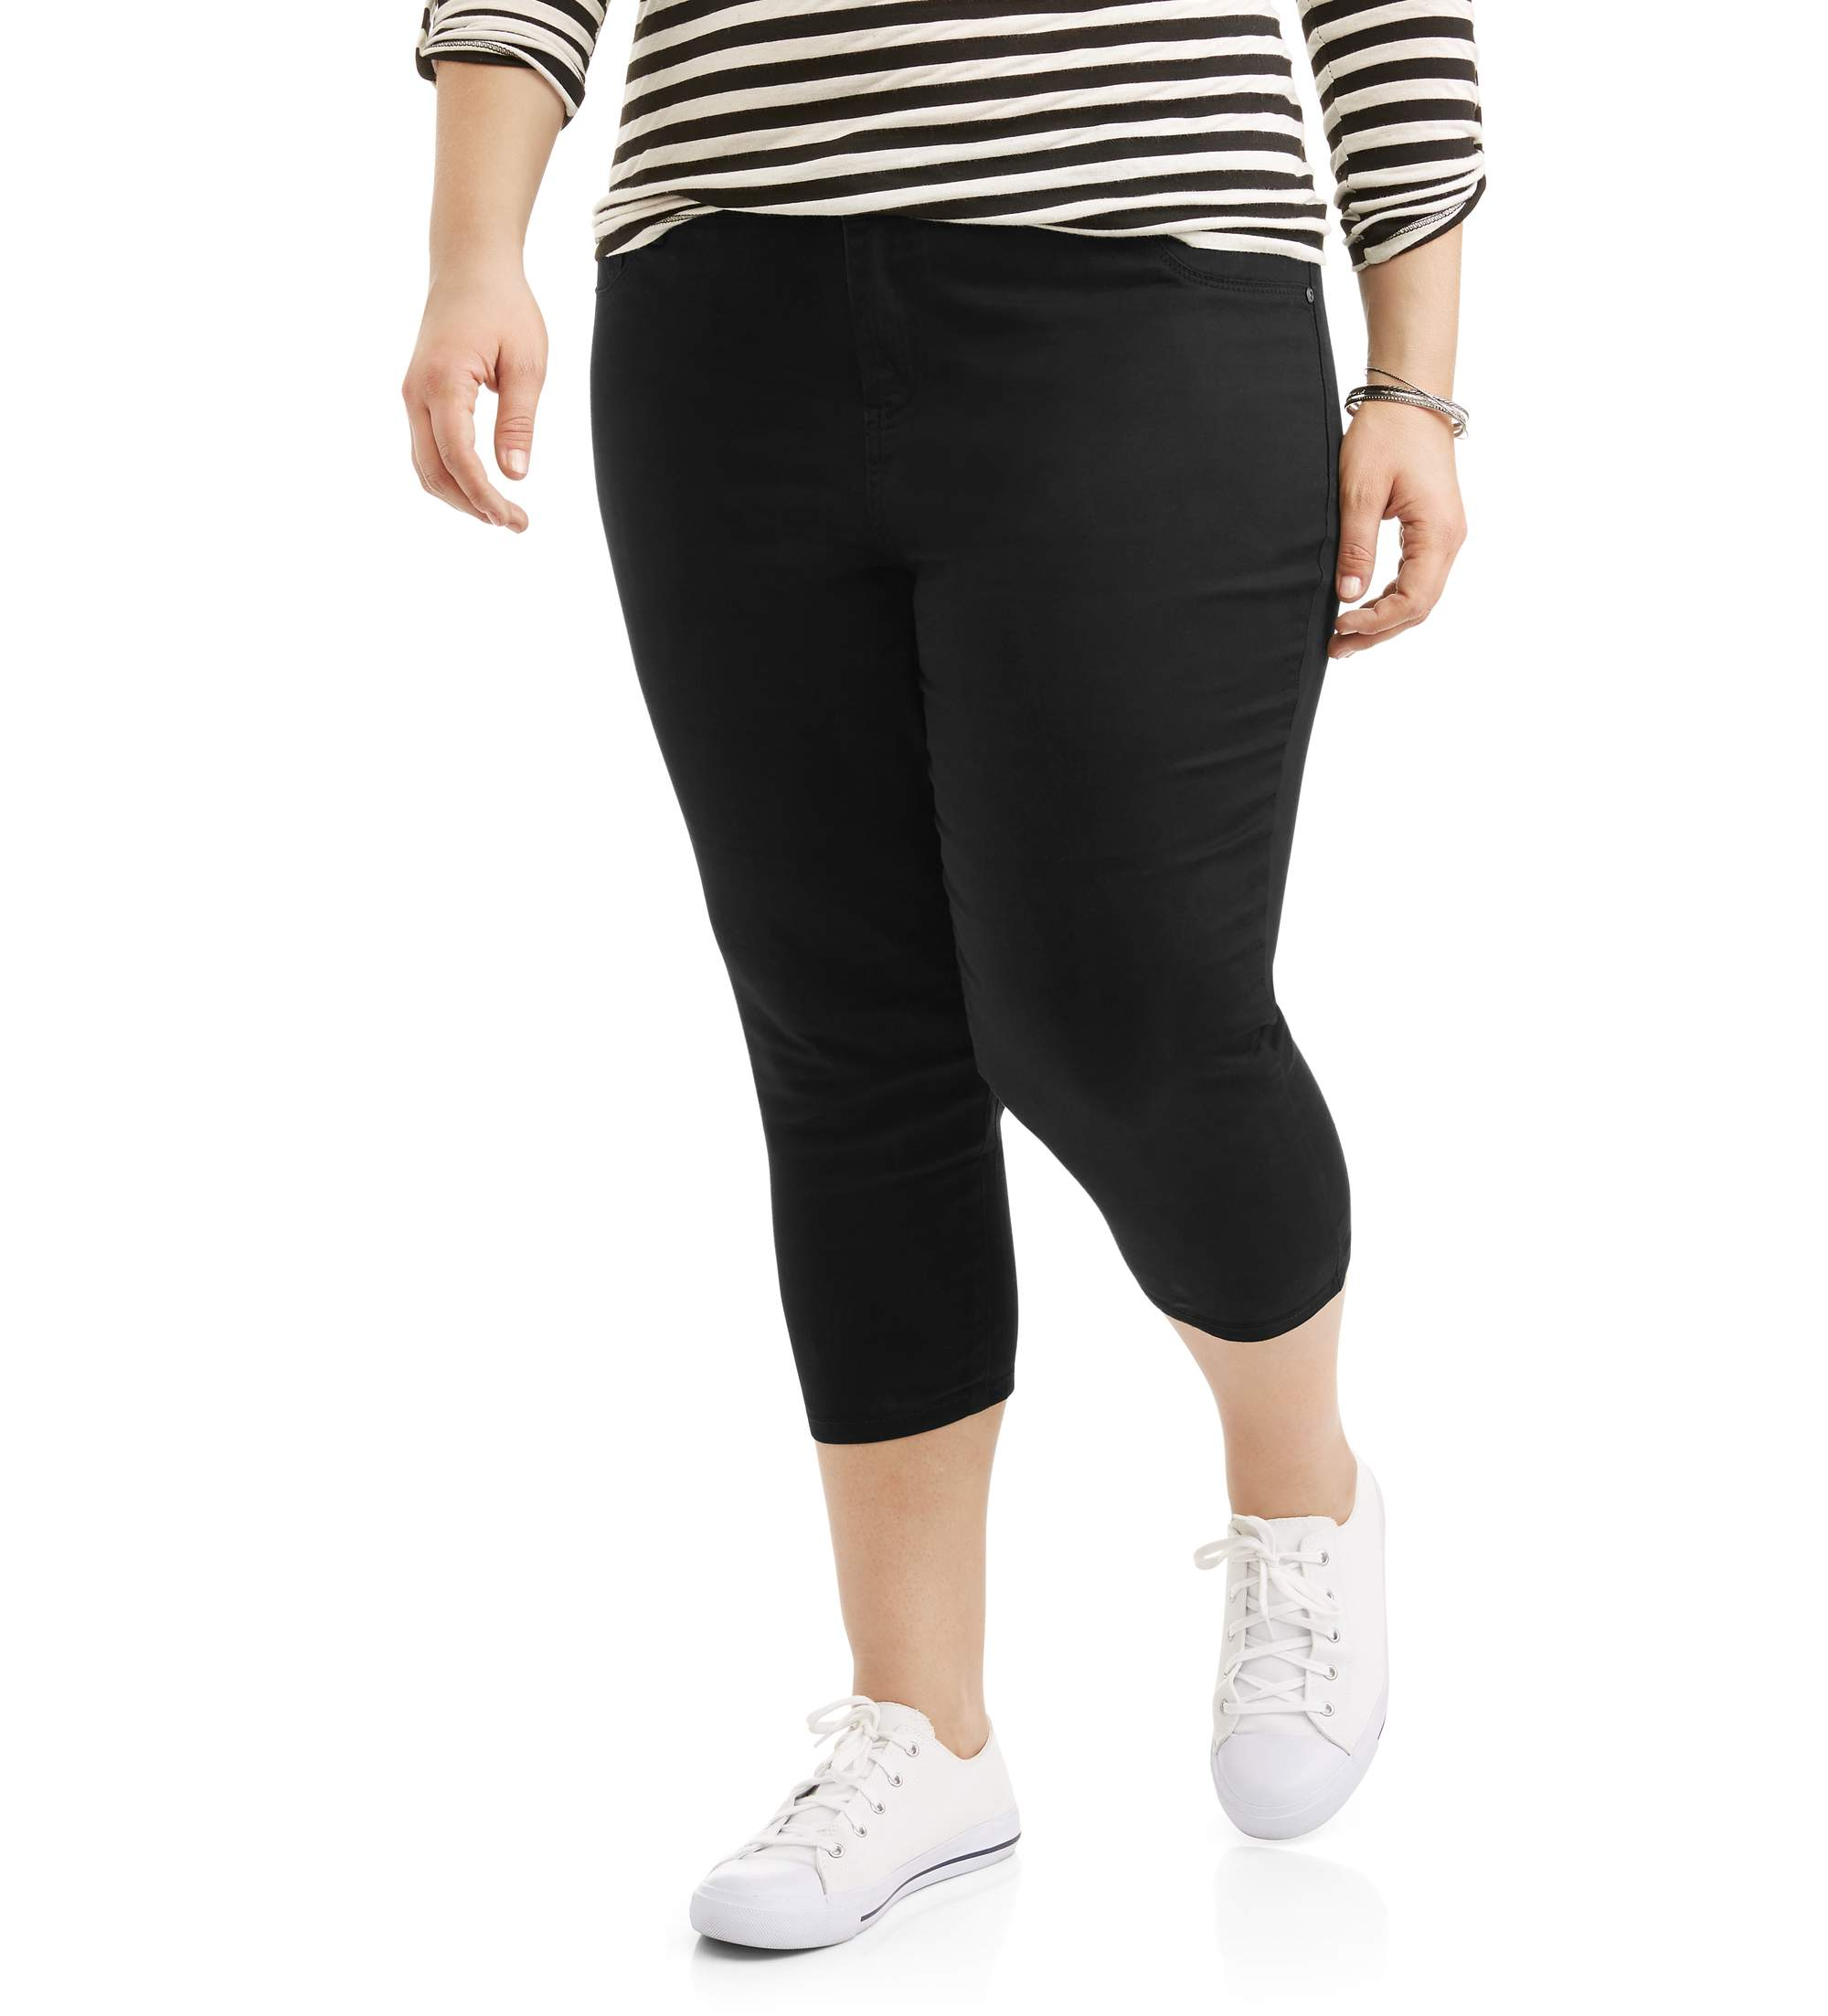 Image of A3 Women's Plus Brushed Stretch Capri Pants